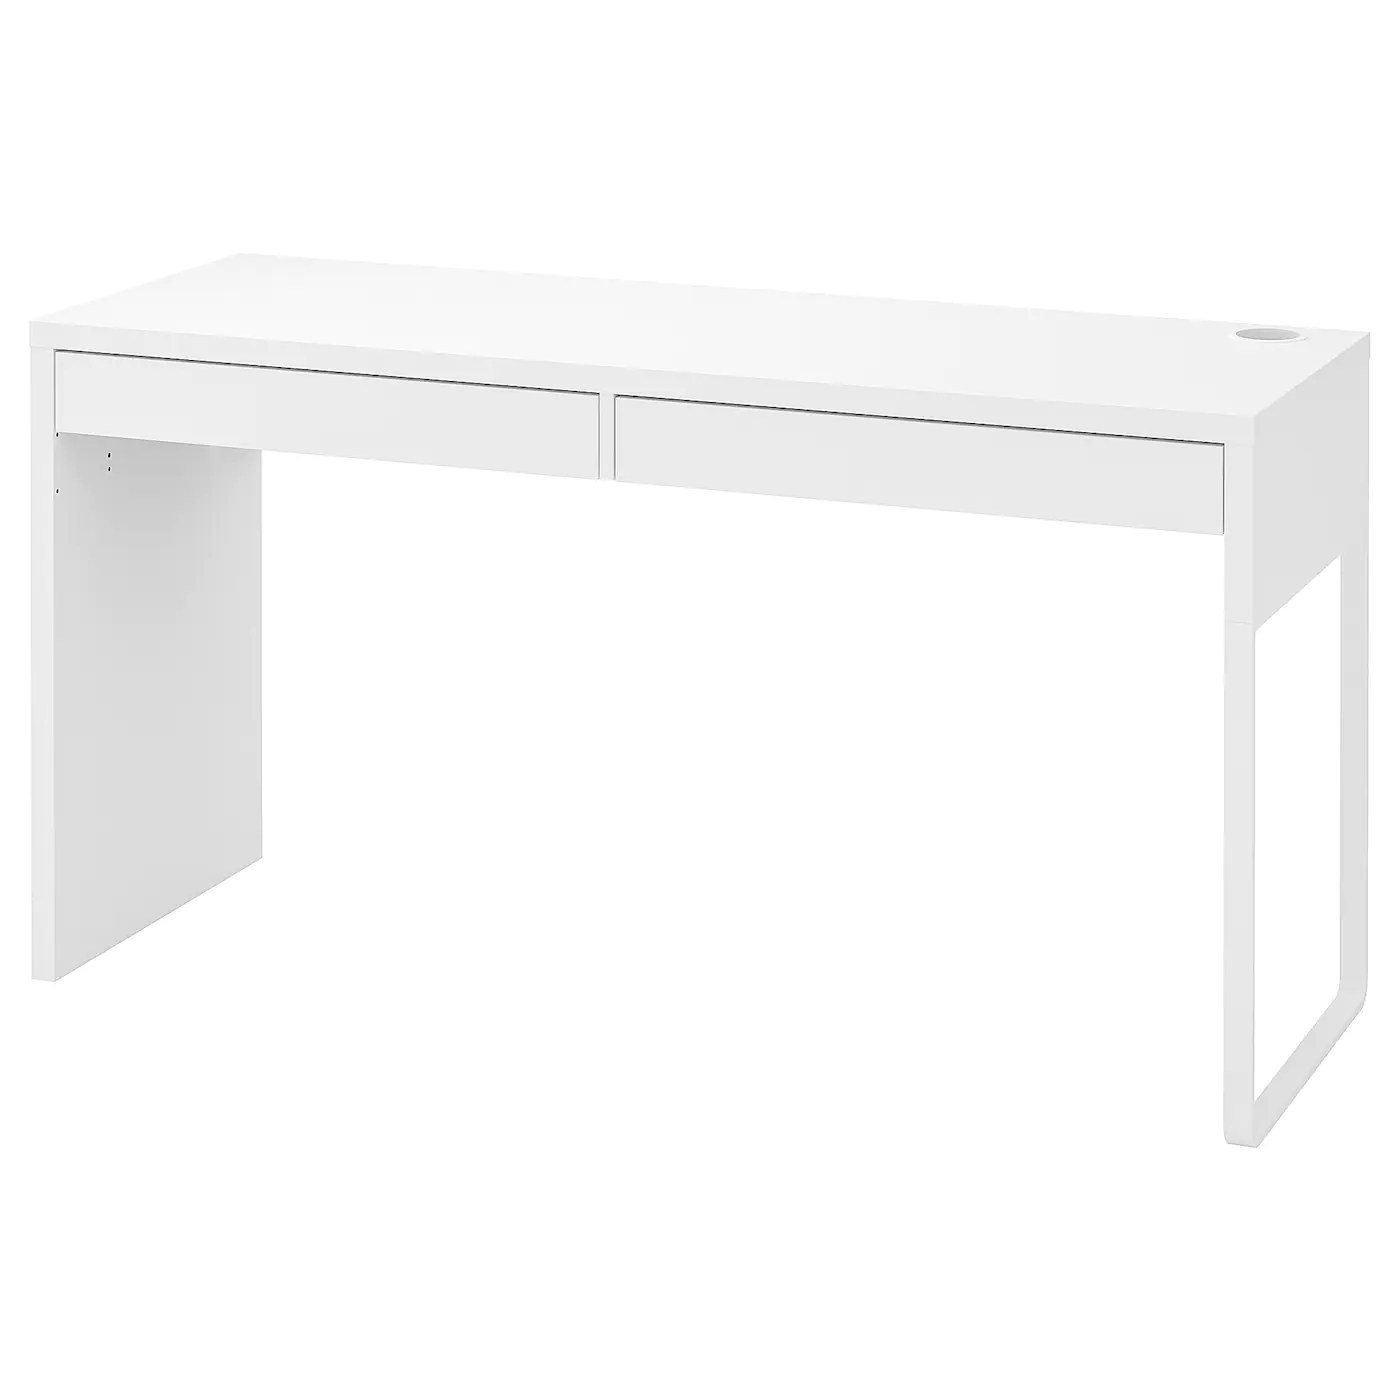 Micke Skrivebord Hvid 142x50 Cm Ikea